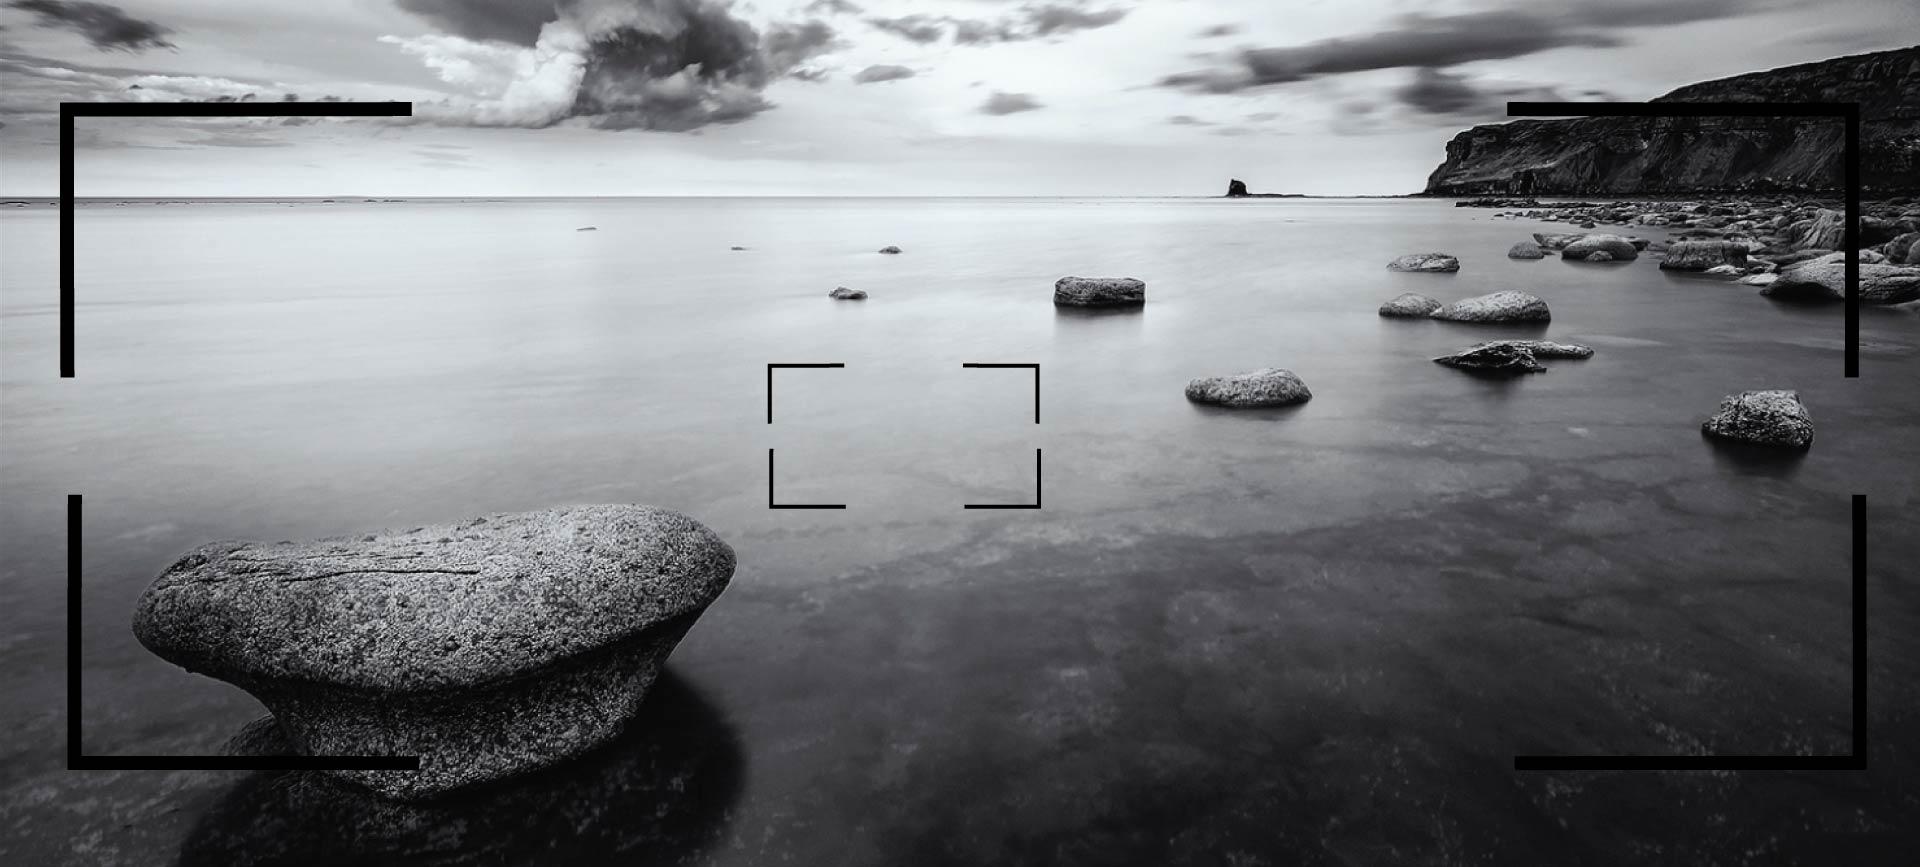 Tone in photography compostion 2 - عناصر ترکیب بندی در عکاسی